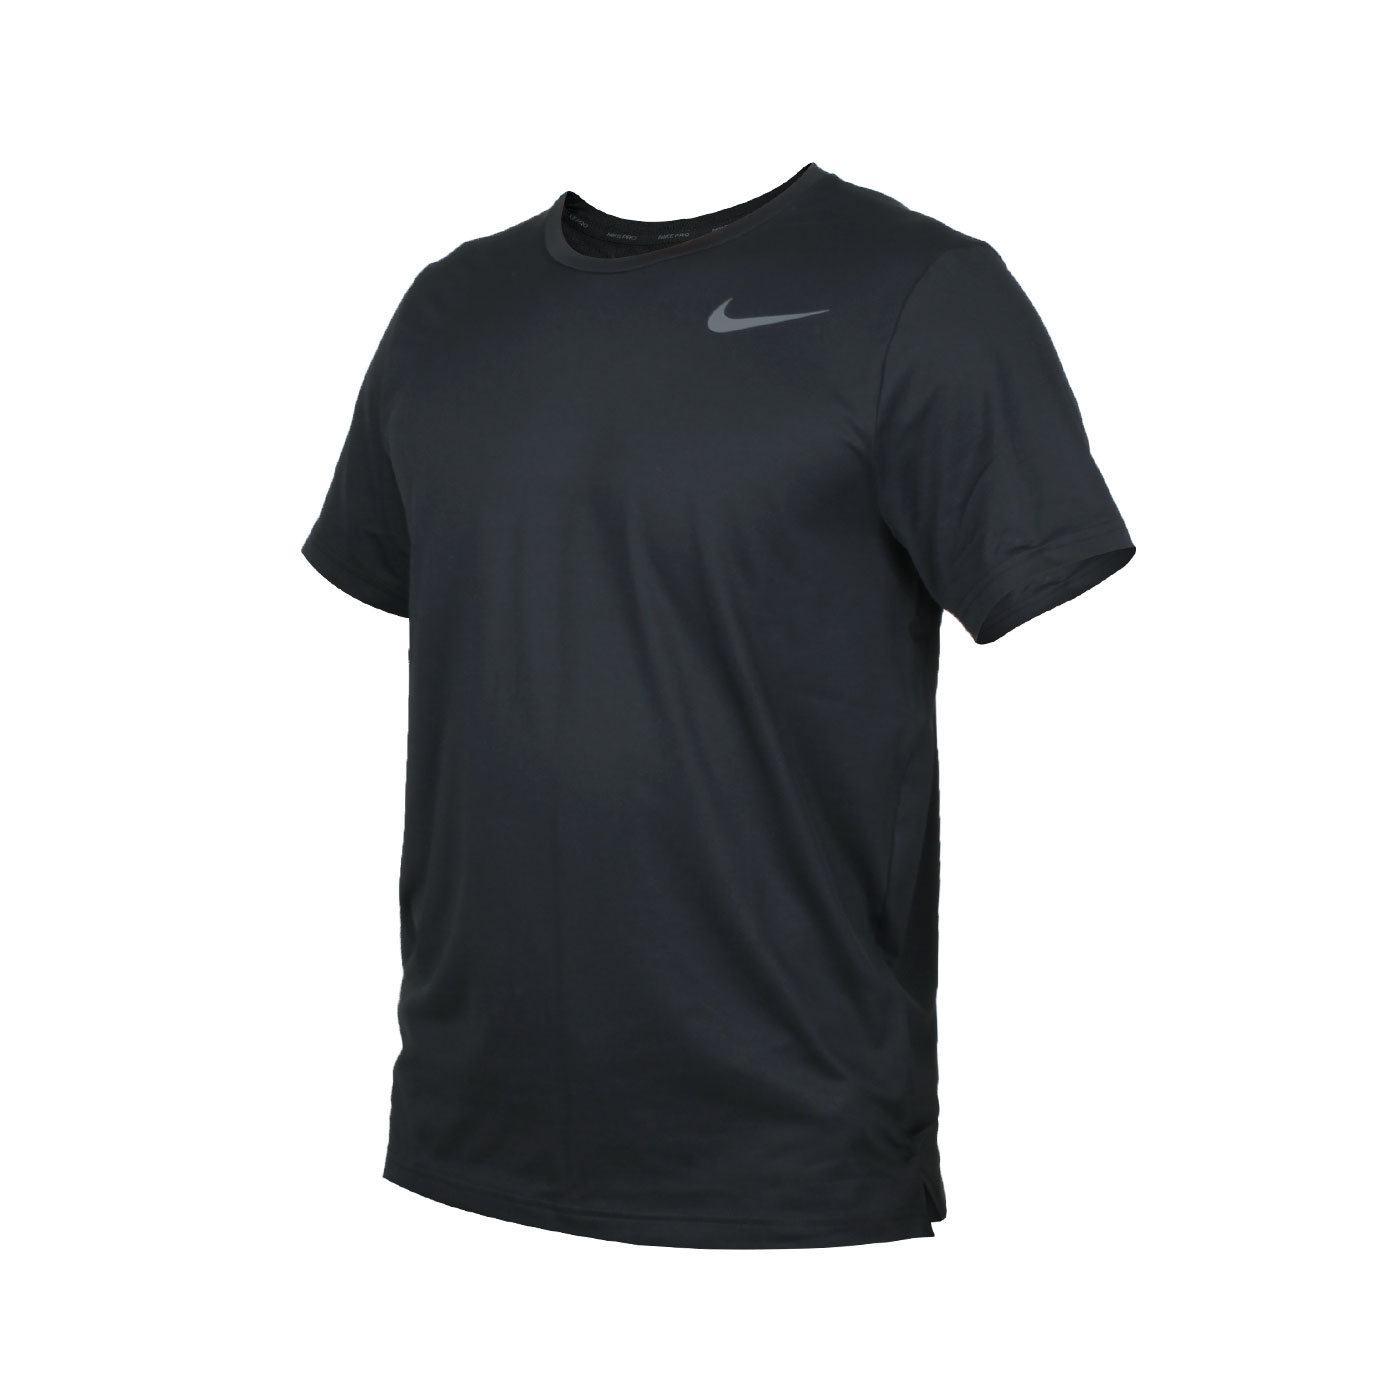 NIKE 男款訓練排汗短袖T恤 CJ4612-010